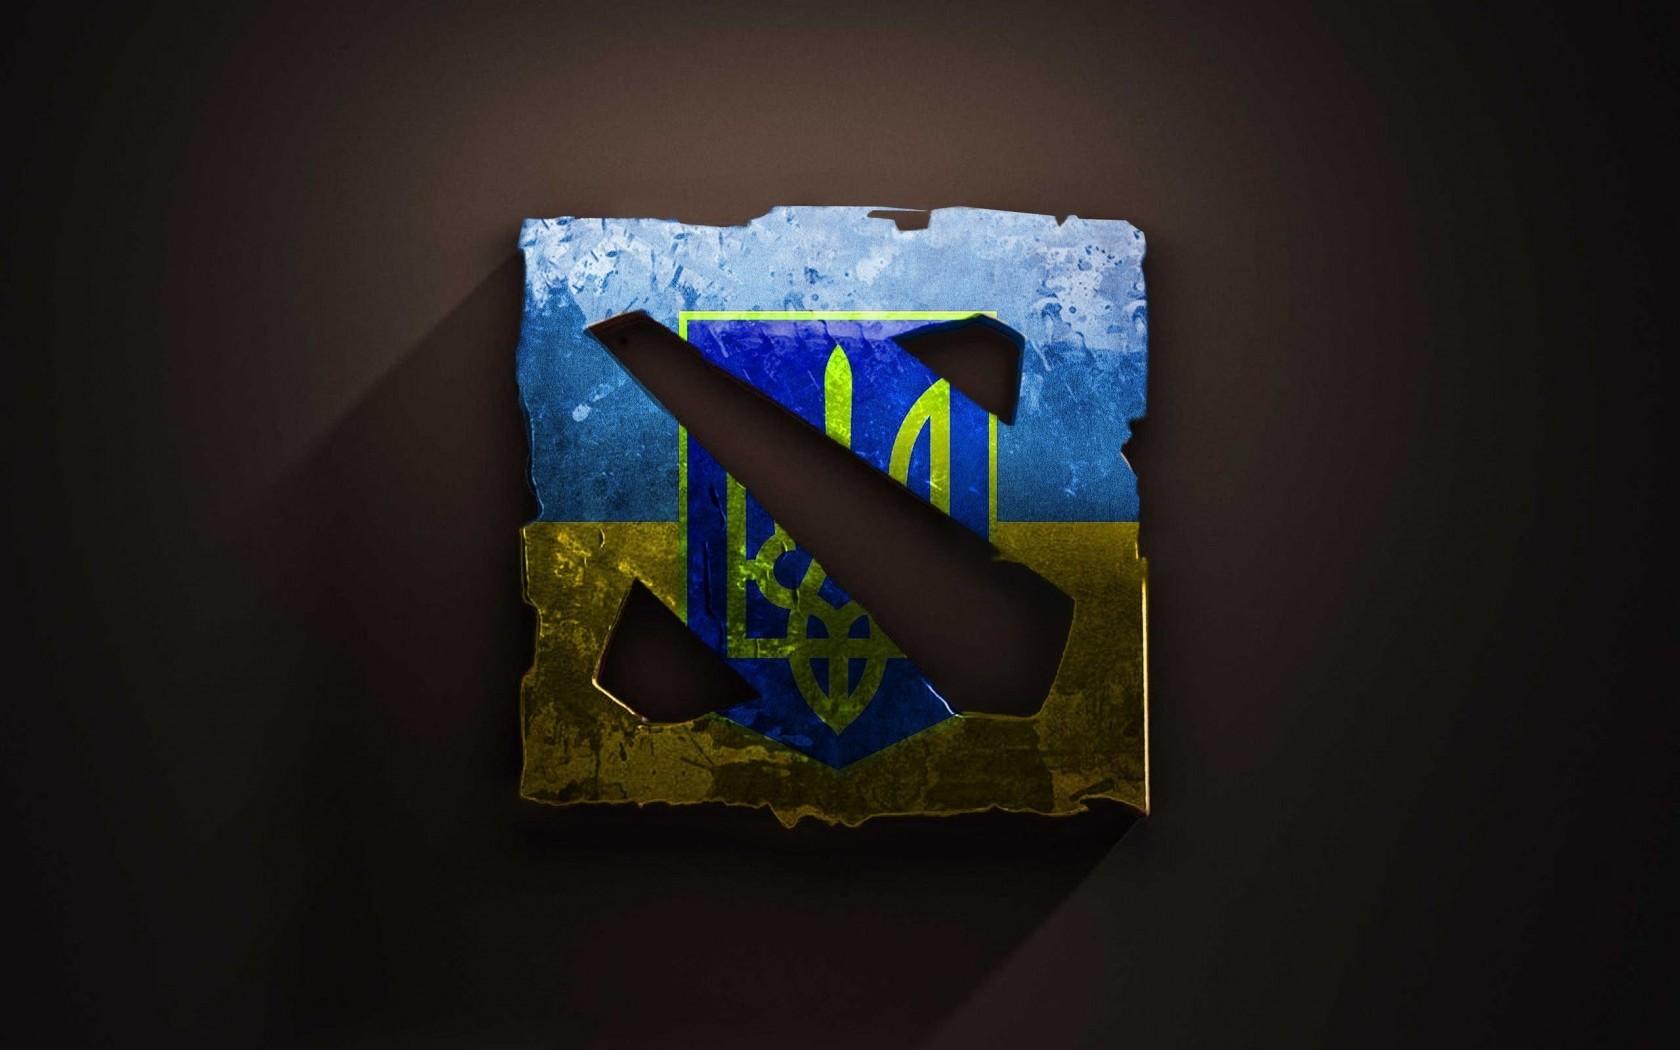 Dota 2 Ukraine hd wallpapers 1920x1080